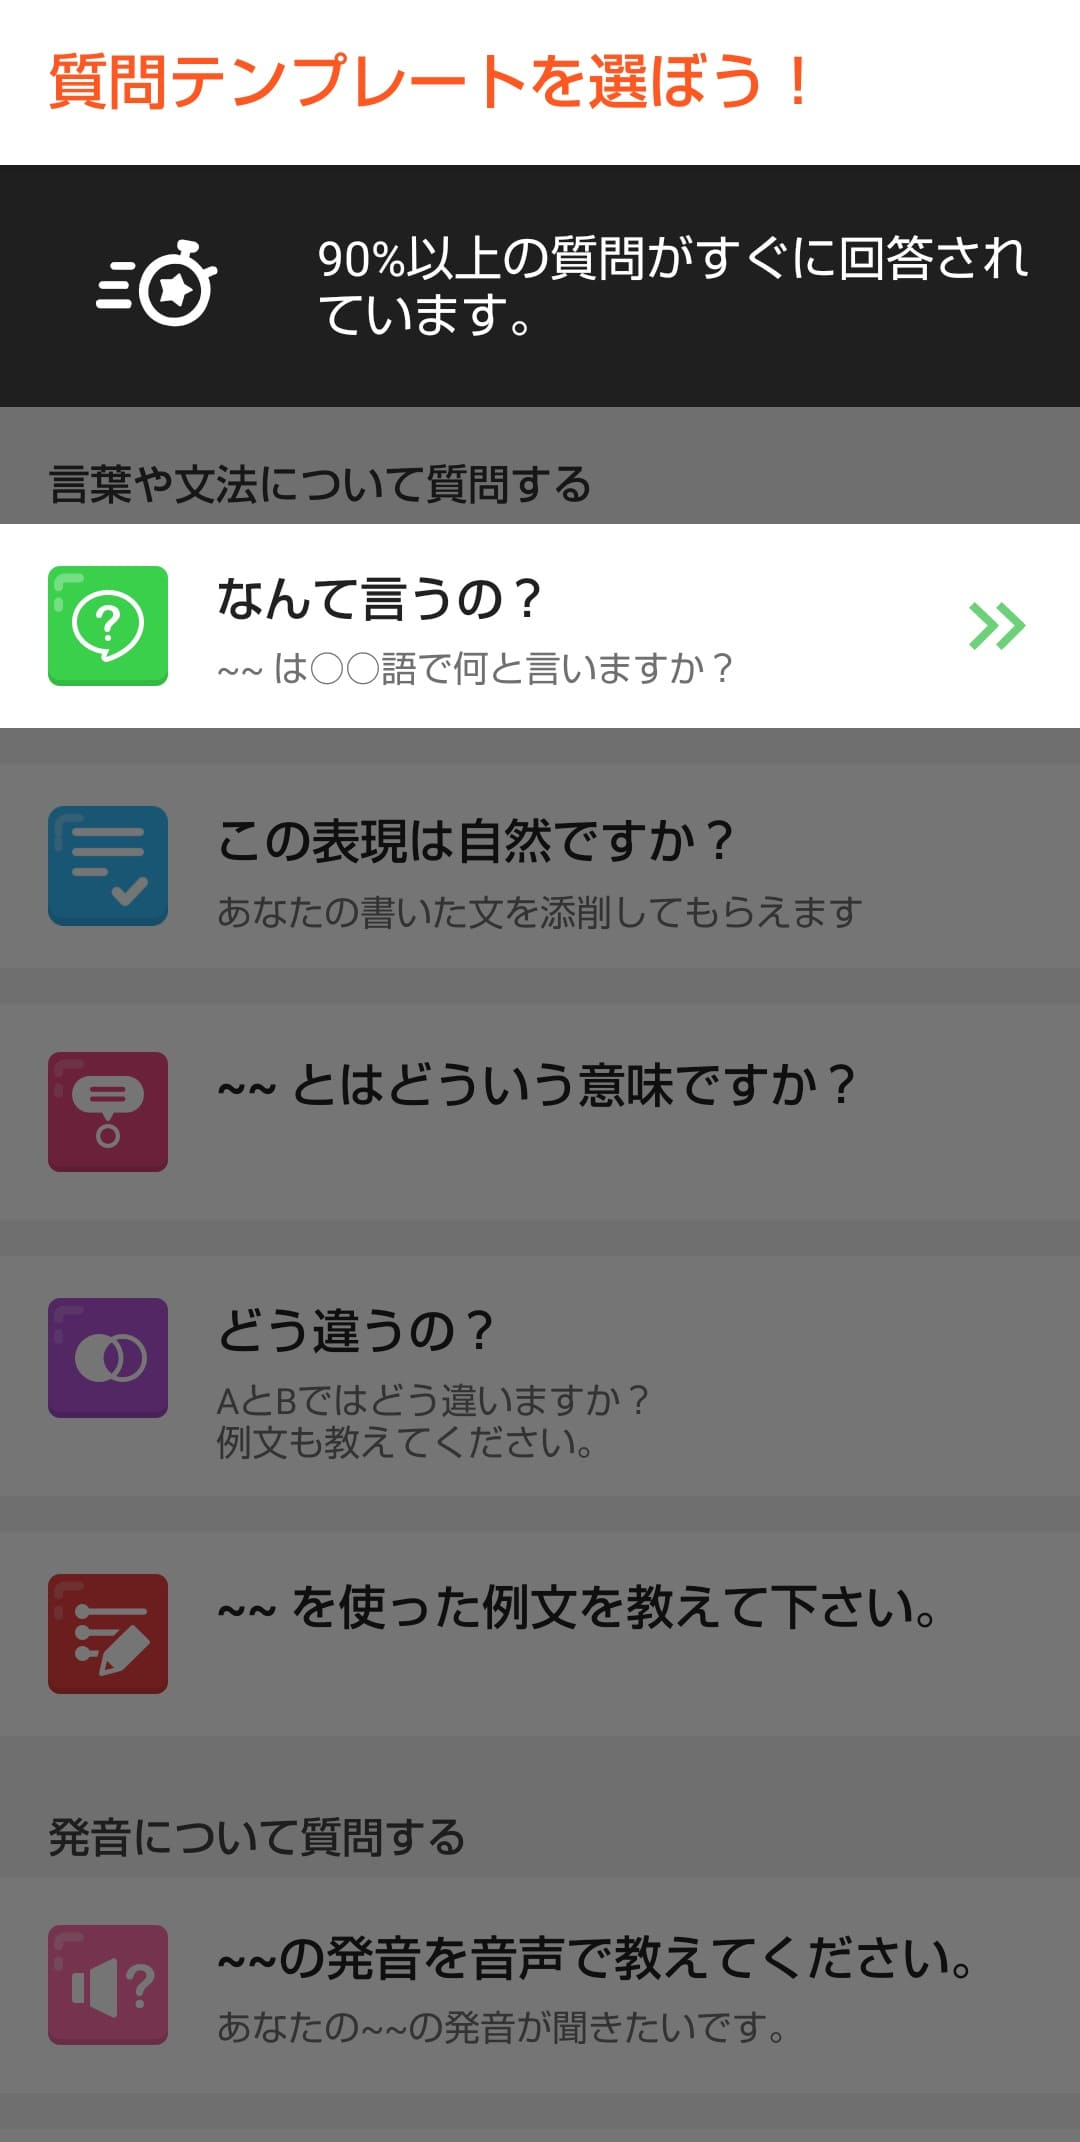 HiNative:質問テスト